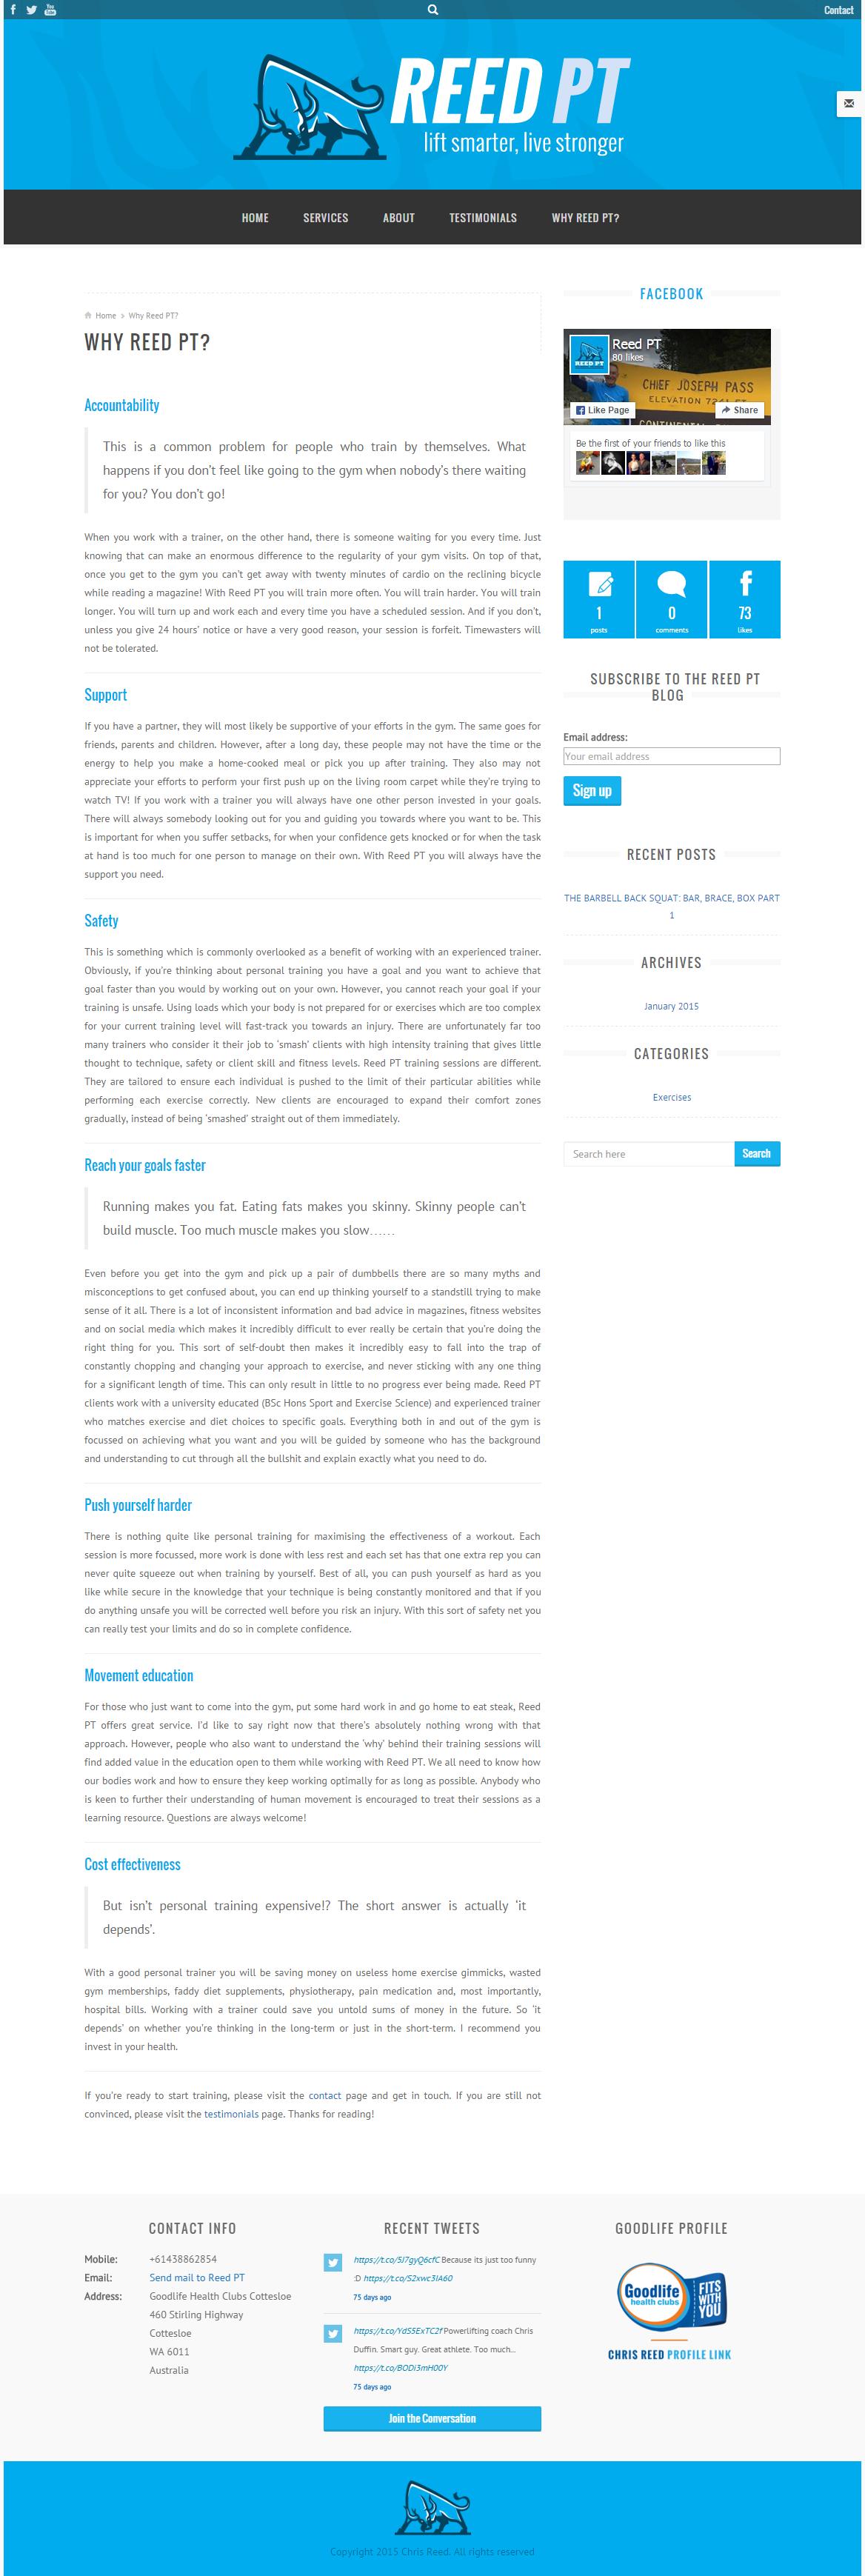 WB-portfolio-web-design-Reed-PT-gallery-2